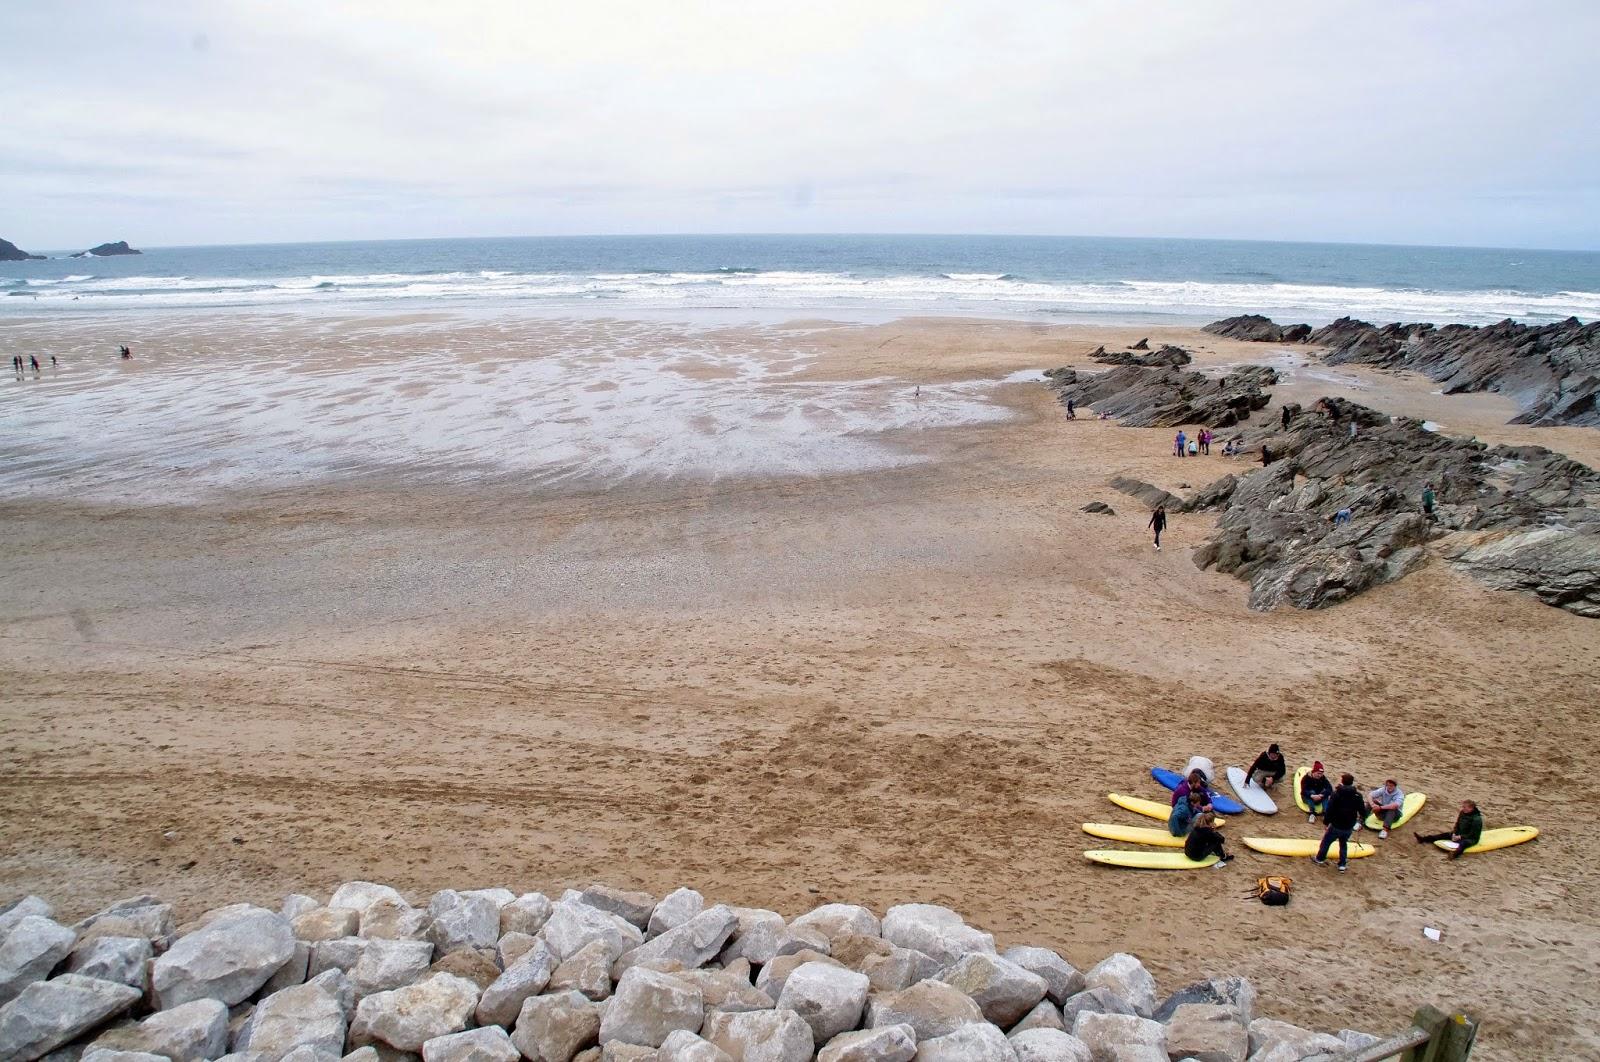 https://www.theaussieflashpacker.com/2015/04/exploring-britains-best-beaches-newquay.html